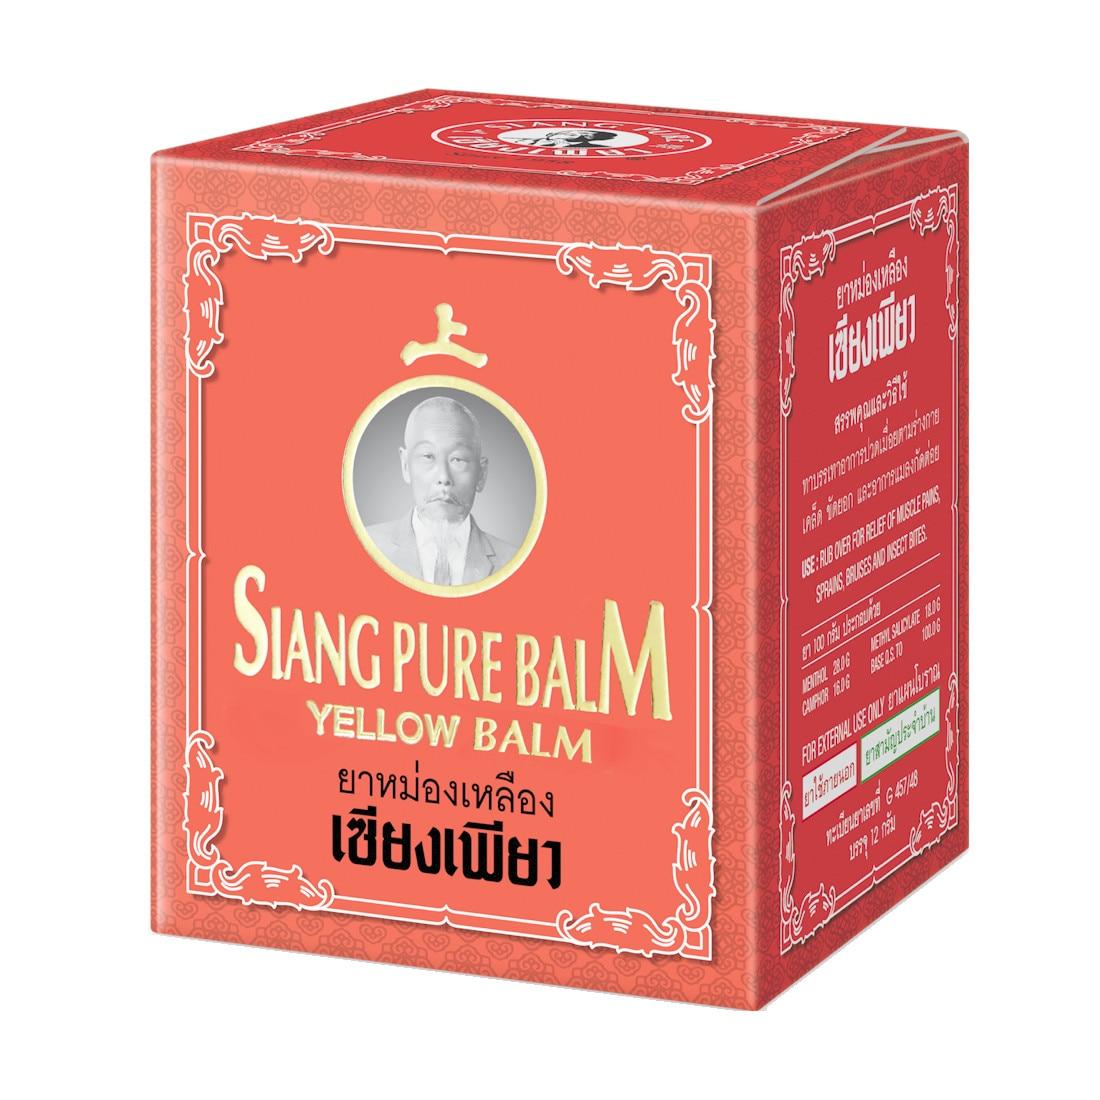 Siang Pure Balsam Alb răcoritor, 40g Unguent pentru dureri articulare în Thailanda